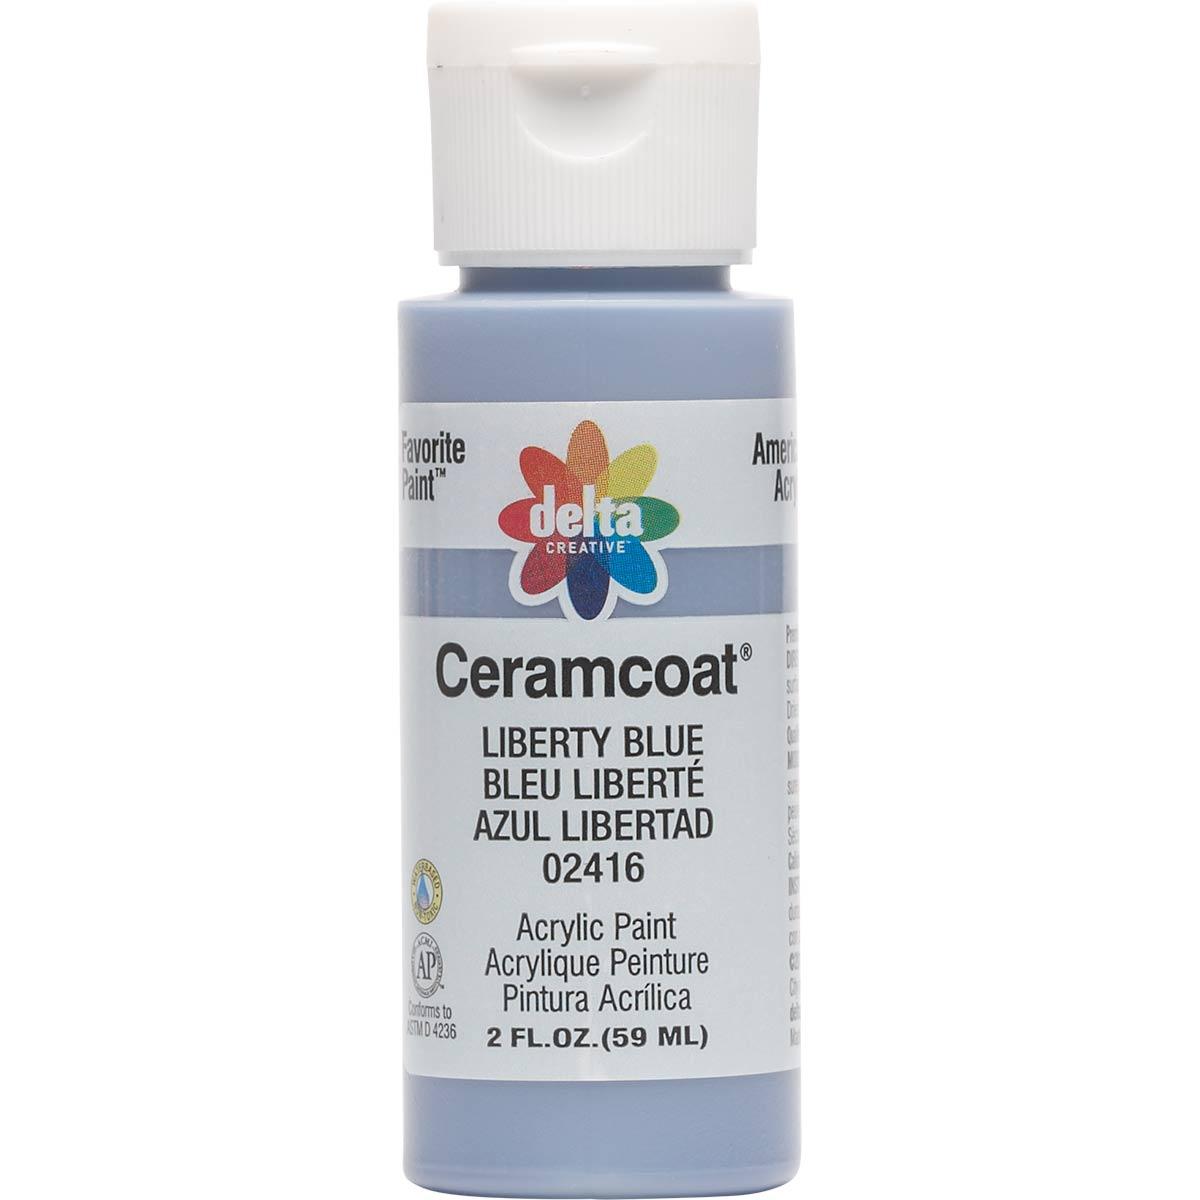 Delta Ceramcoat ® Acrylic Paint - Liberty Blue, 2 oz. - 024160202W